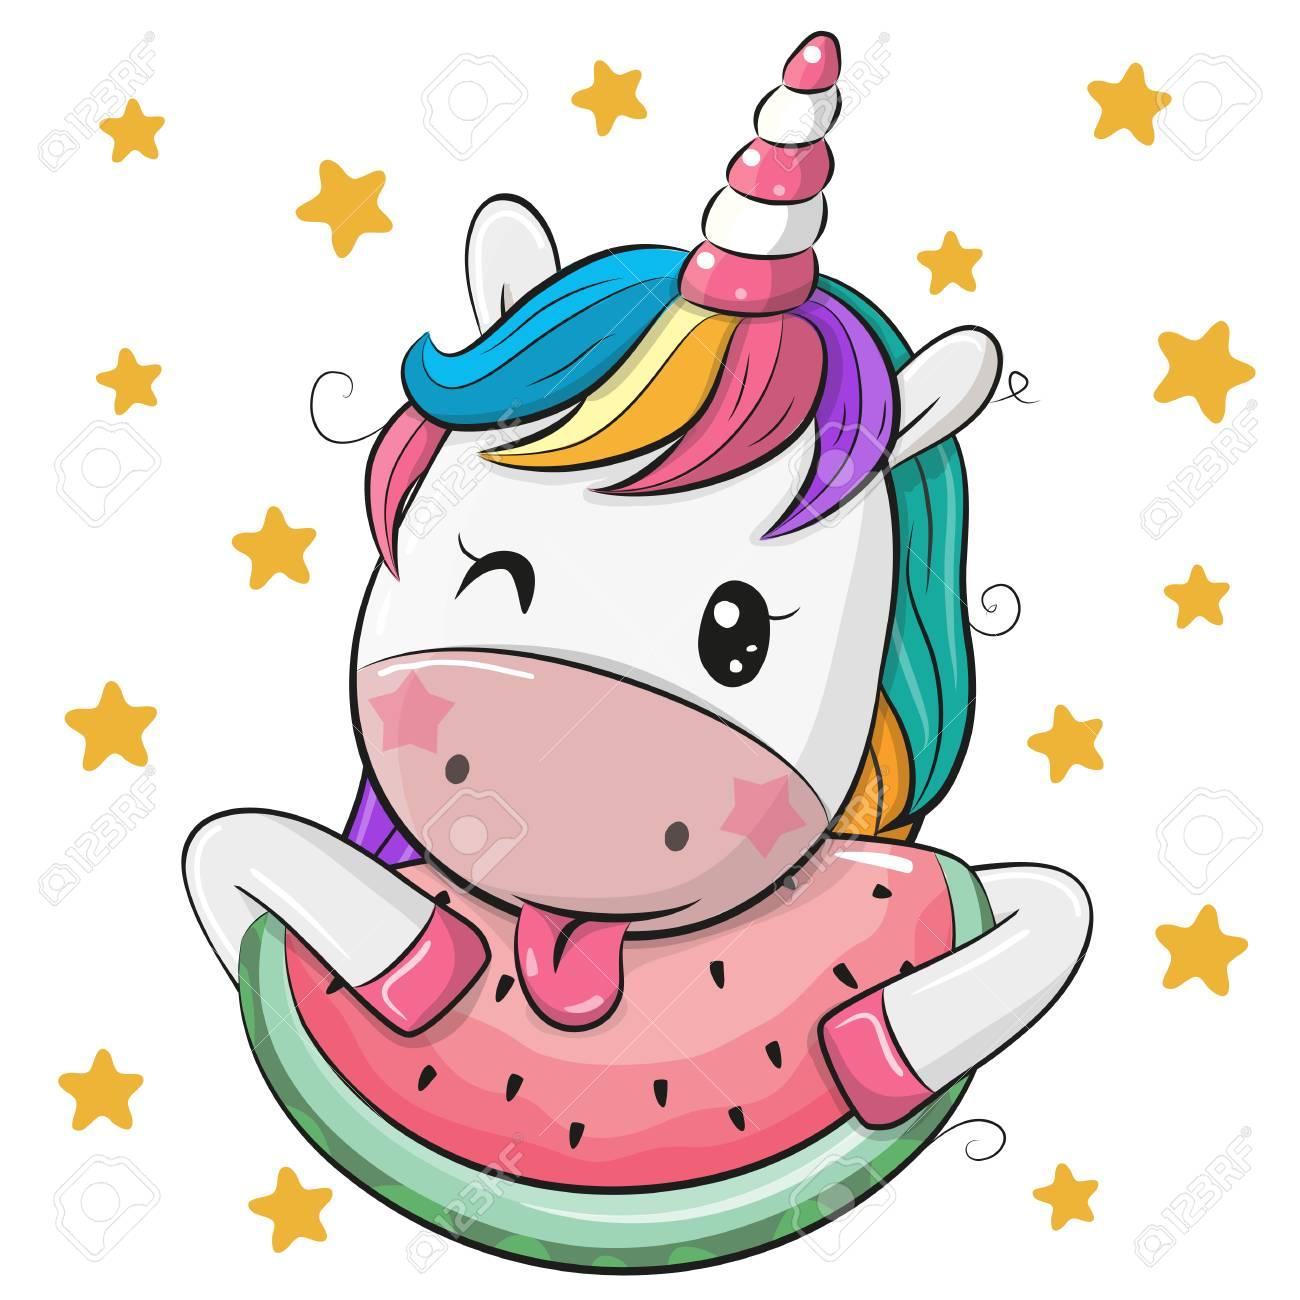 Cute Cartoon Unicorn with watermelon on stars background - 111804045